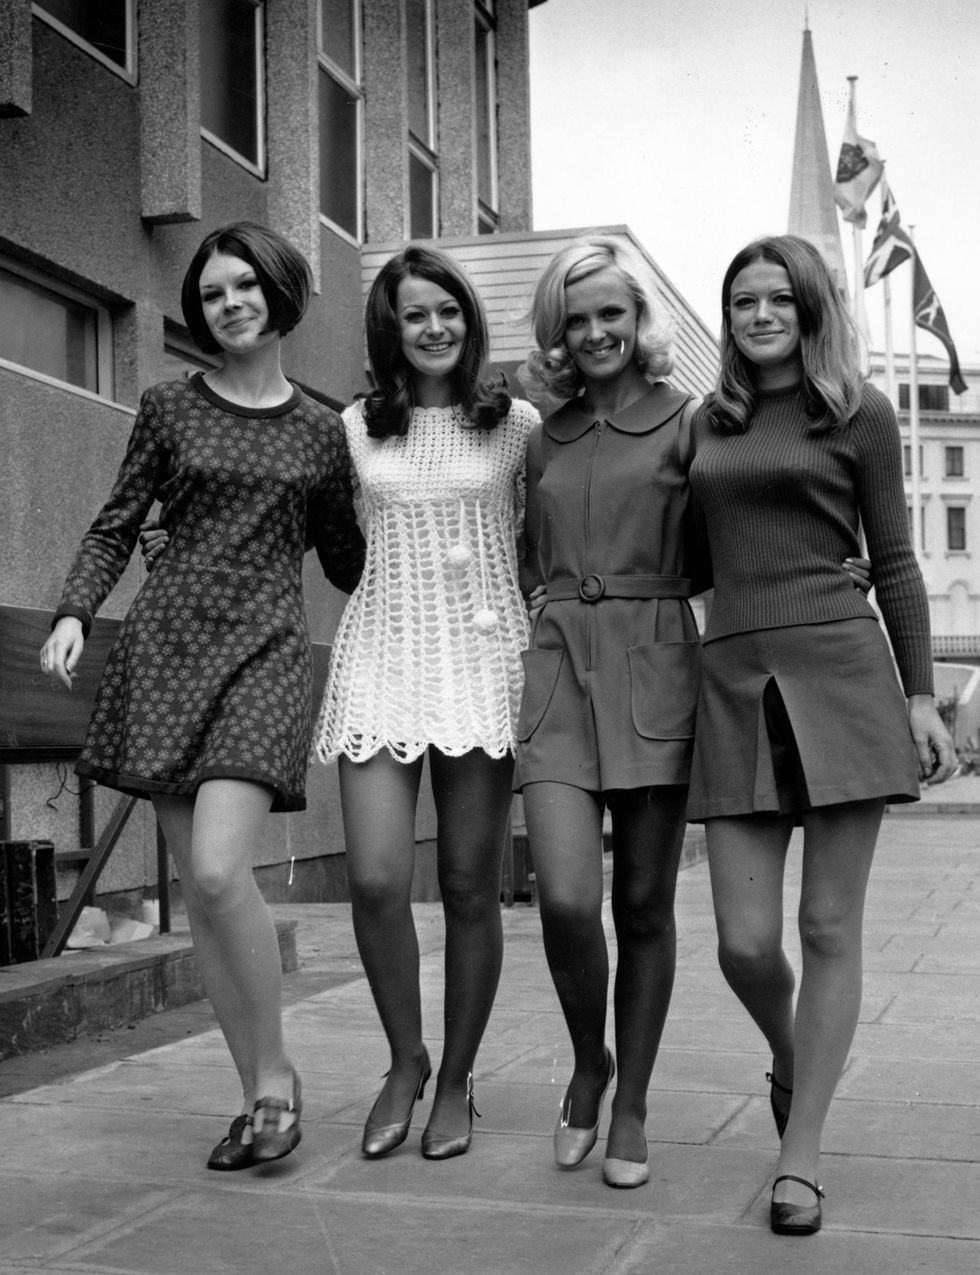 Moda-vintage-mujeres_18